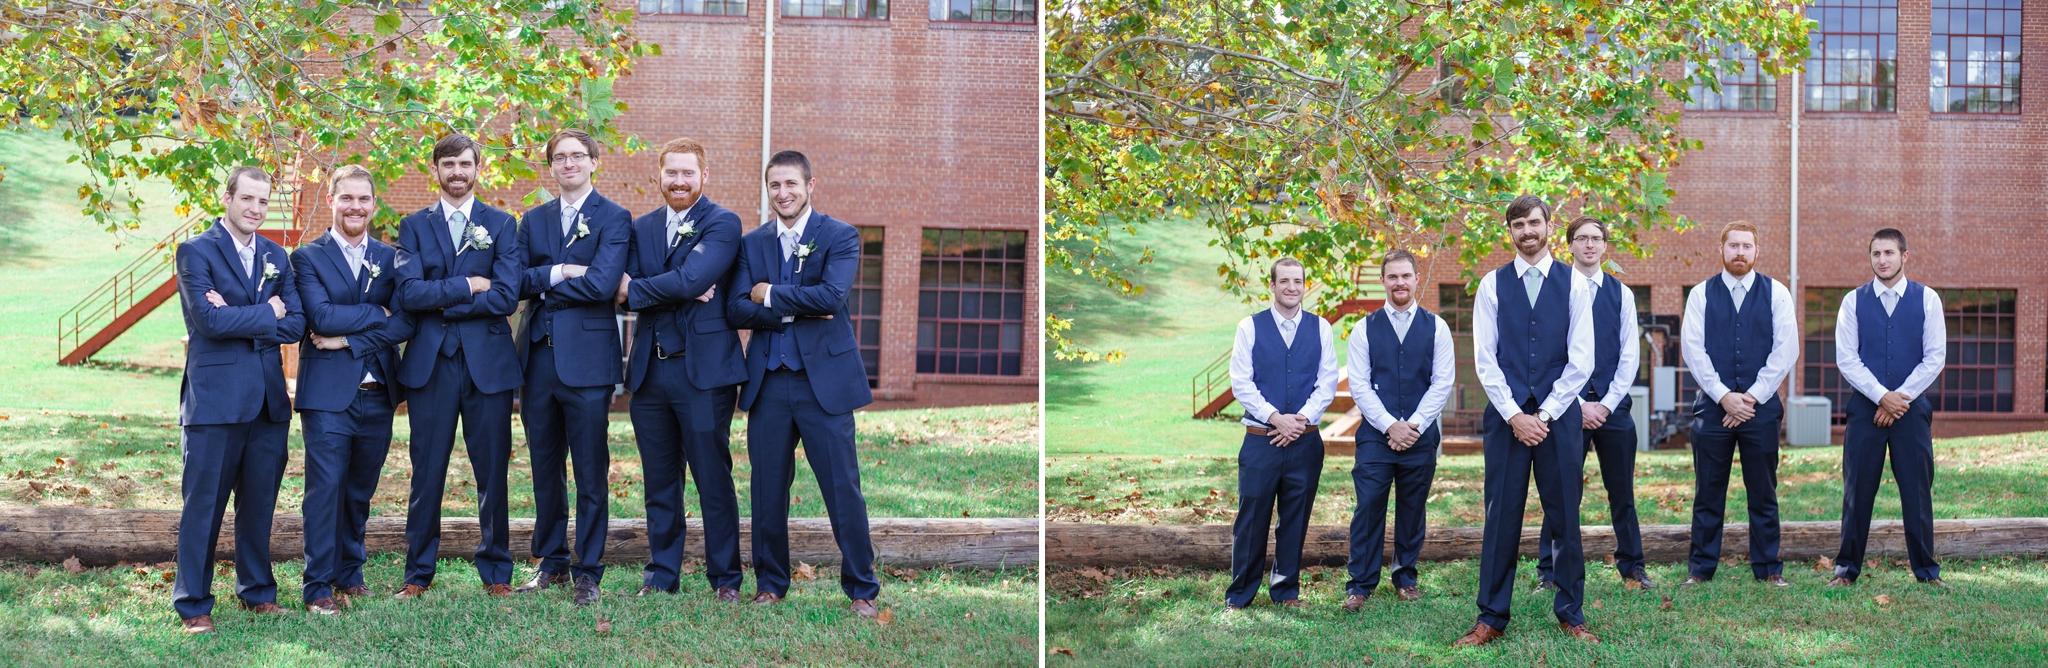 Groomsmen Portraits Chatham Mills in Pittsboro North Carolina Wedding Photography - Johanna Dye - Meredith and Brandon